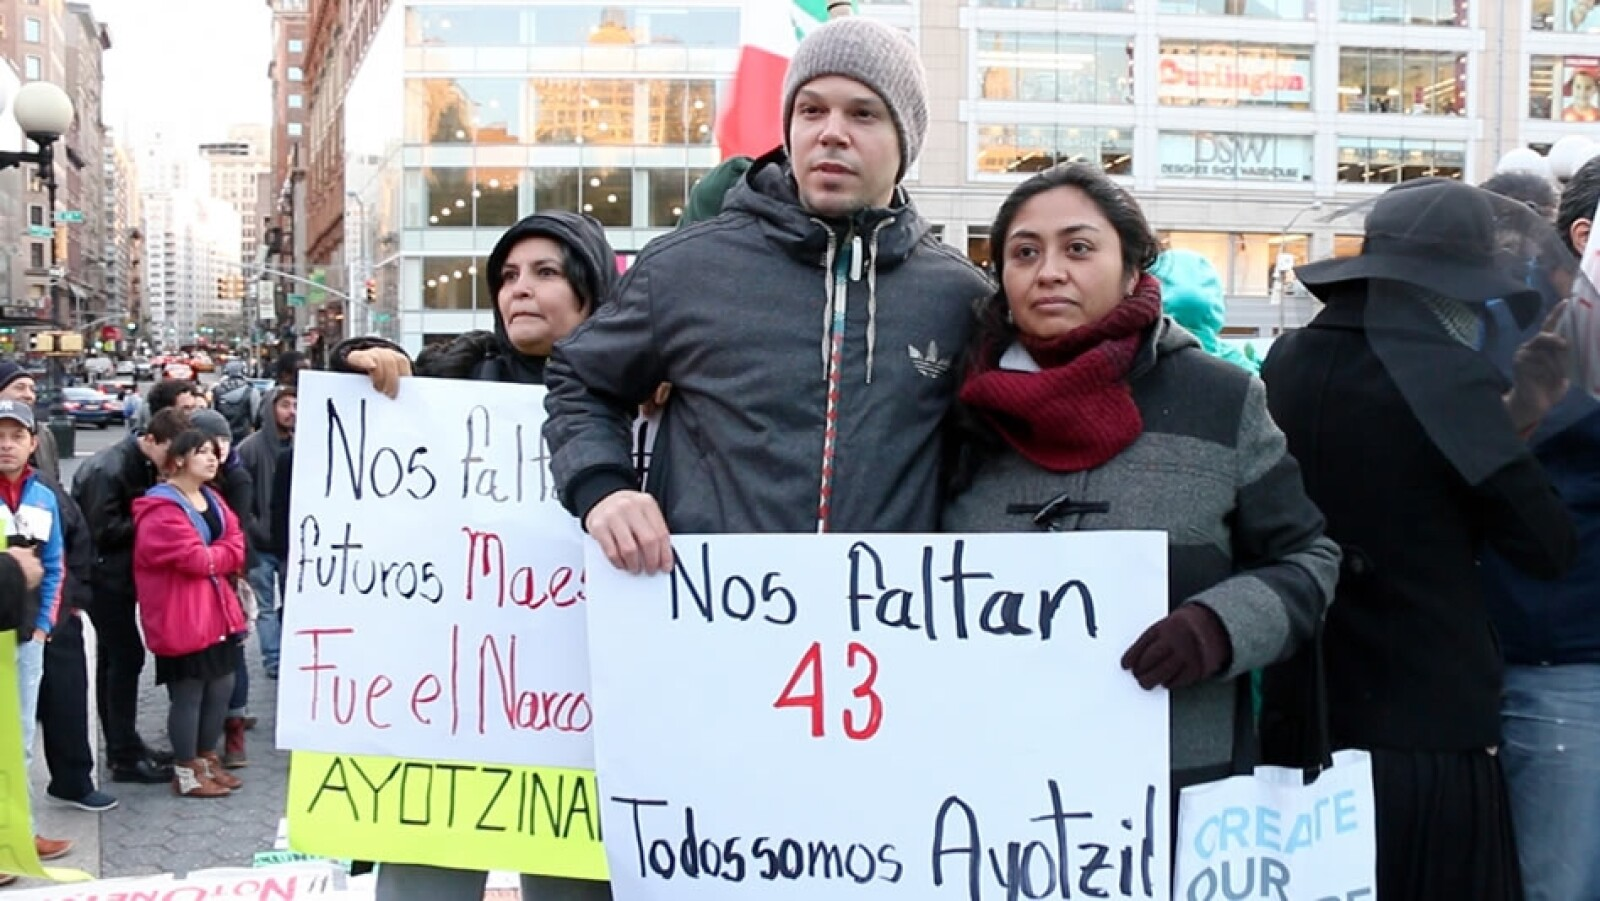 René Pérez Joglar, 'Residente', integrante del grupo Calle 13, acudió a Union Square